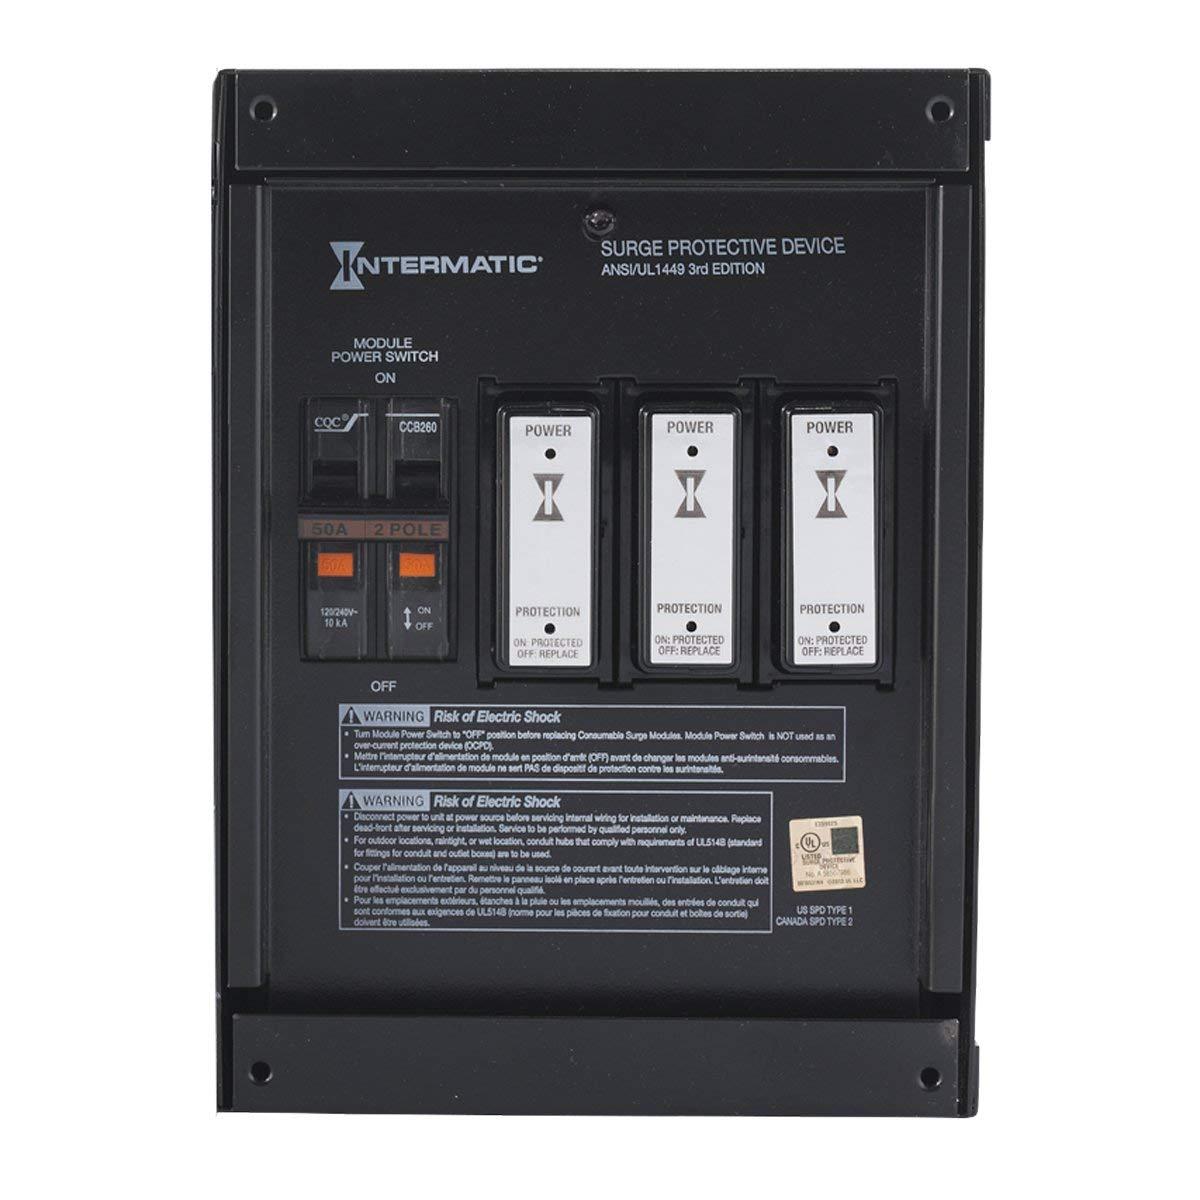 Intermatic Smart Guard IG2240-IMSK Whole Home Surge Protector $212.49